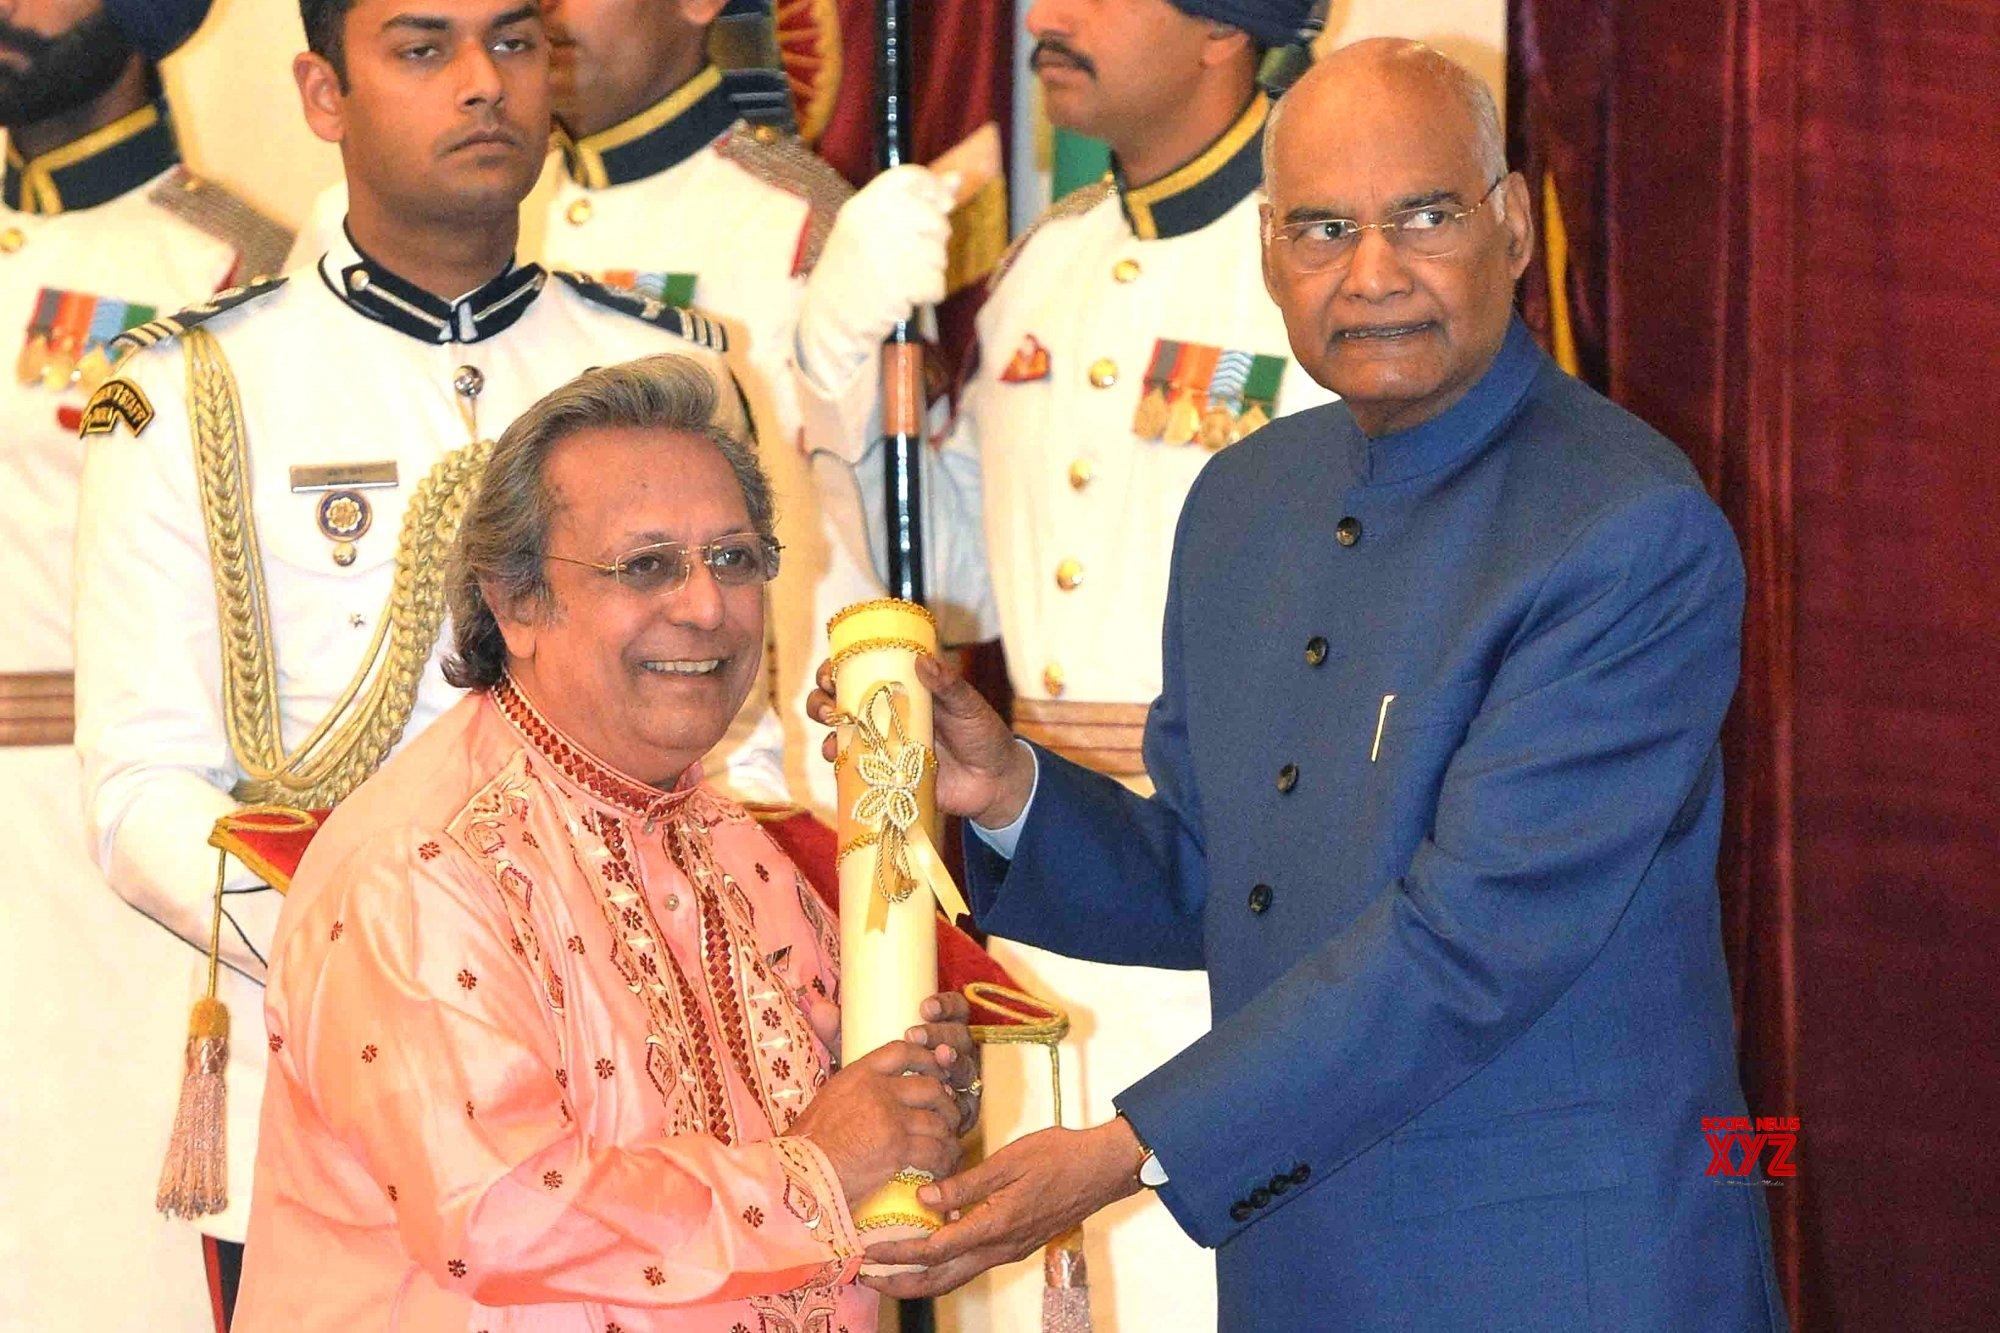 New Delhi: President Kovind presents Padma Awards - Swapan Chaudhuri (Batch 13) #Gallery